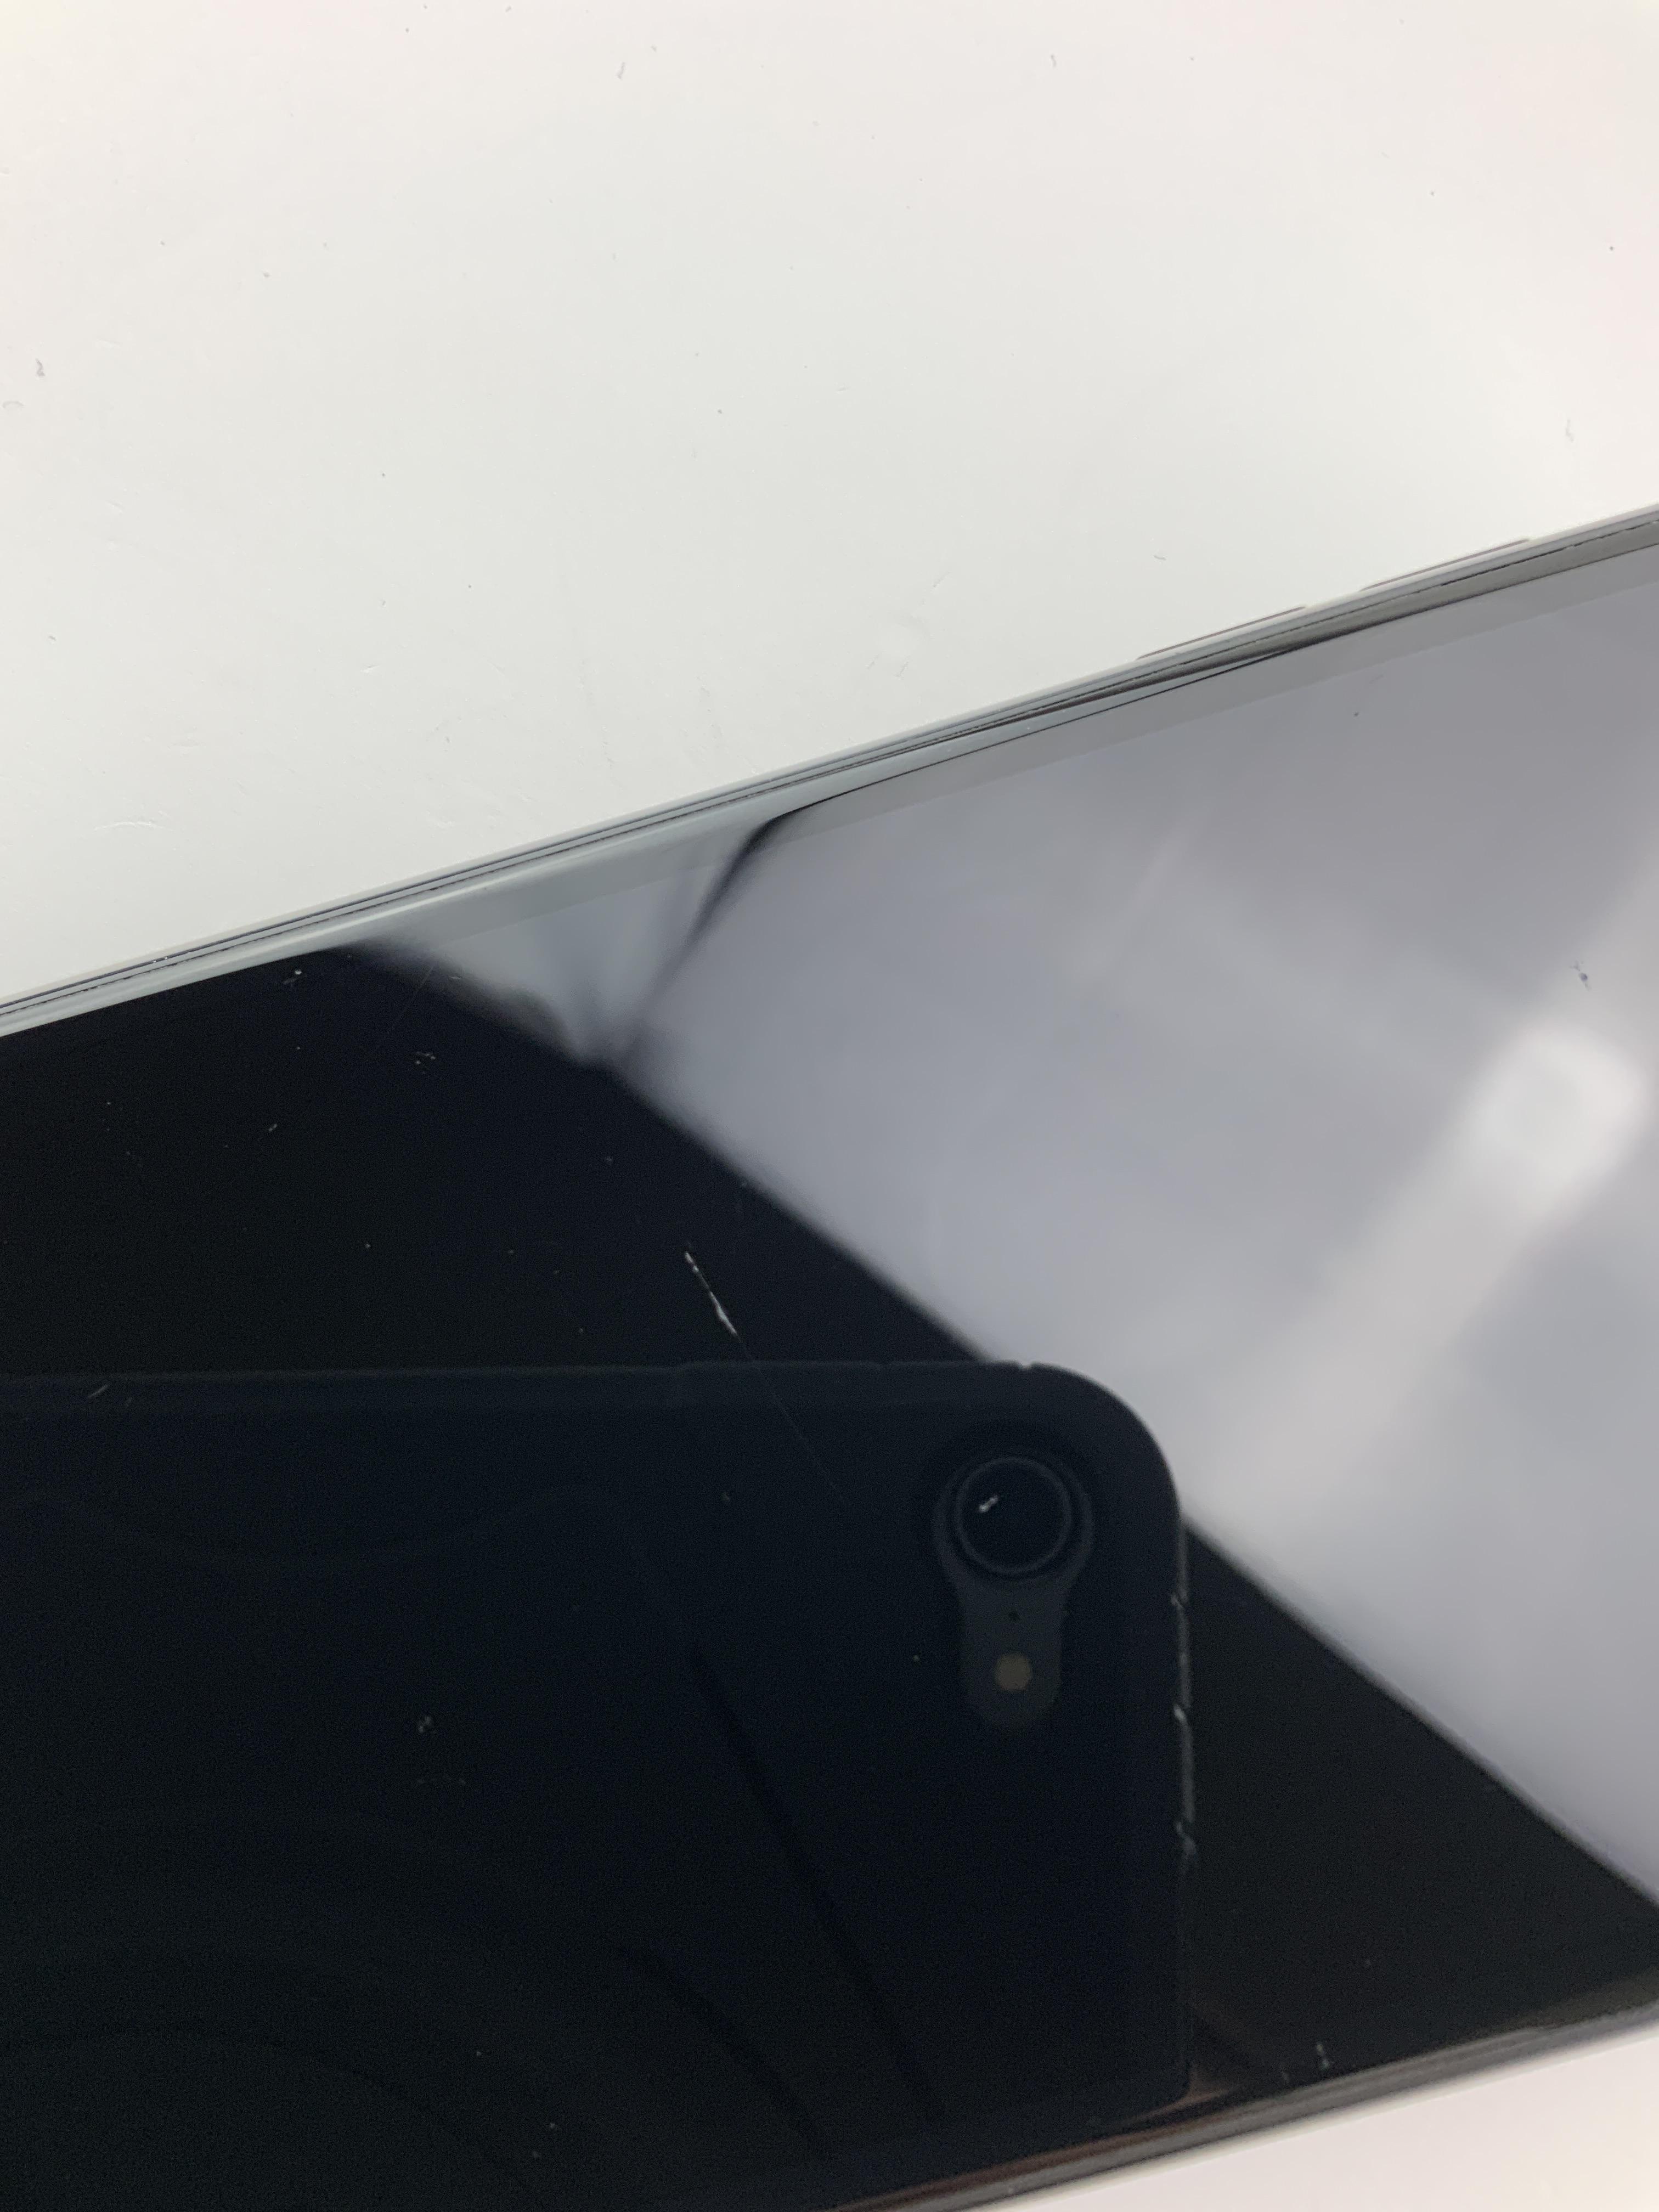 iPhone XR 64GB, 64GB, Black, Afbeelding 5